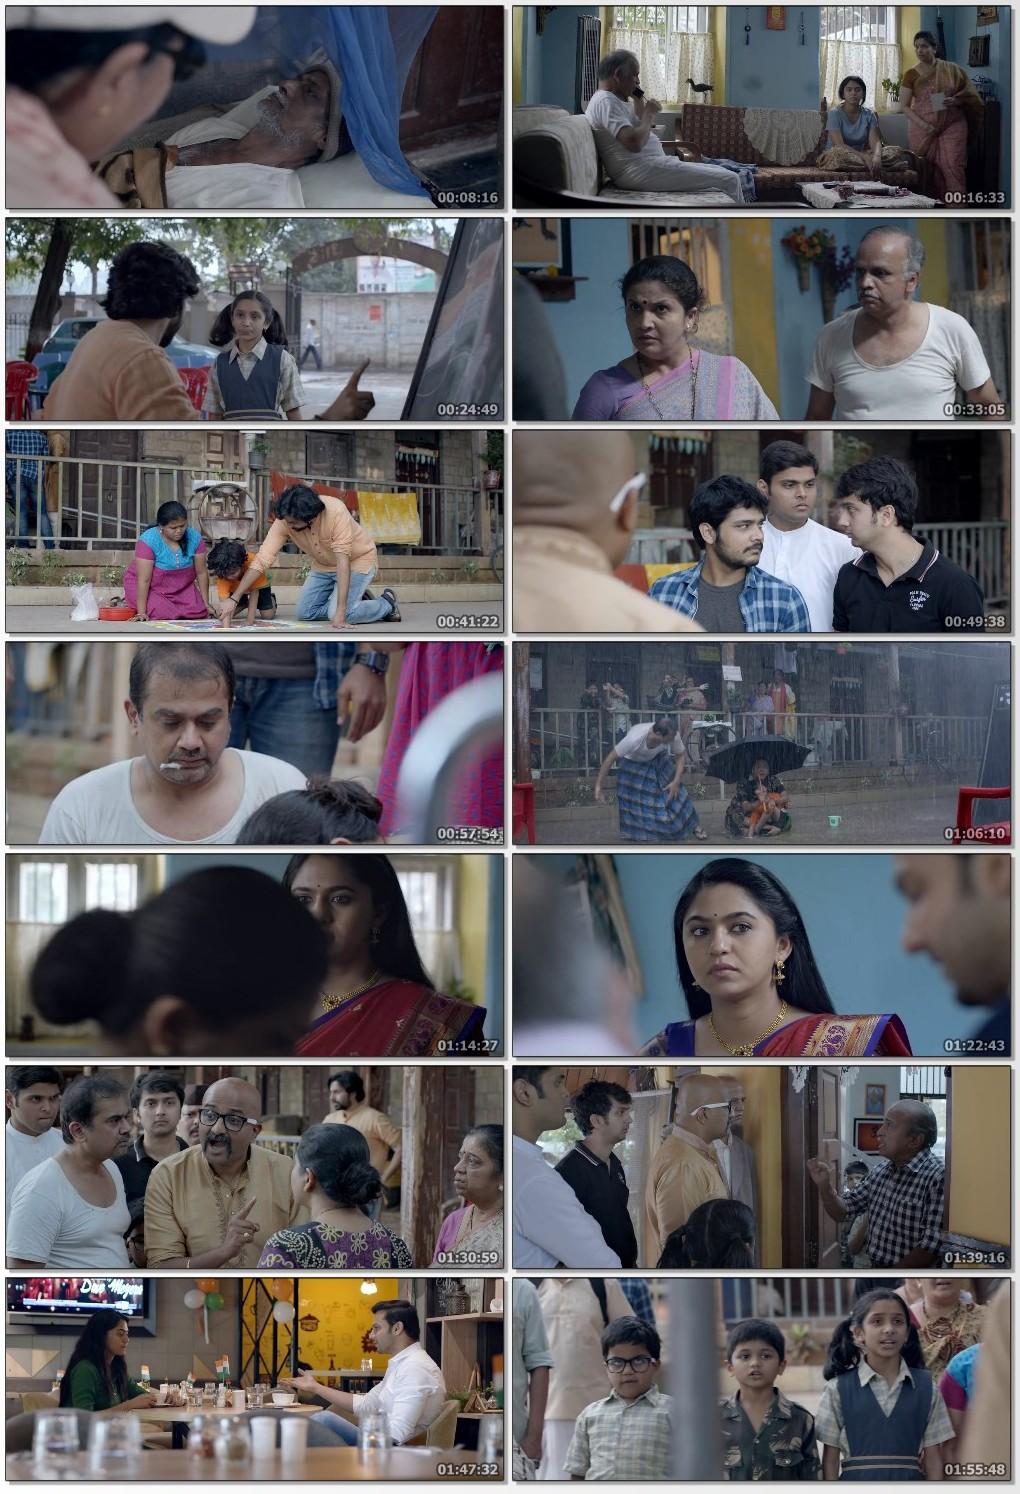 15 August Movie download 480p, 15 August Movie download 720p, 15 August Movie download 300mb, 15 August Movie download free